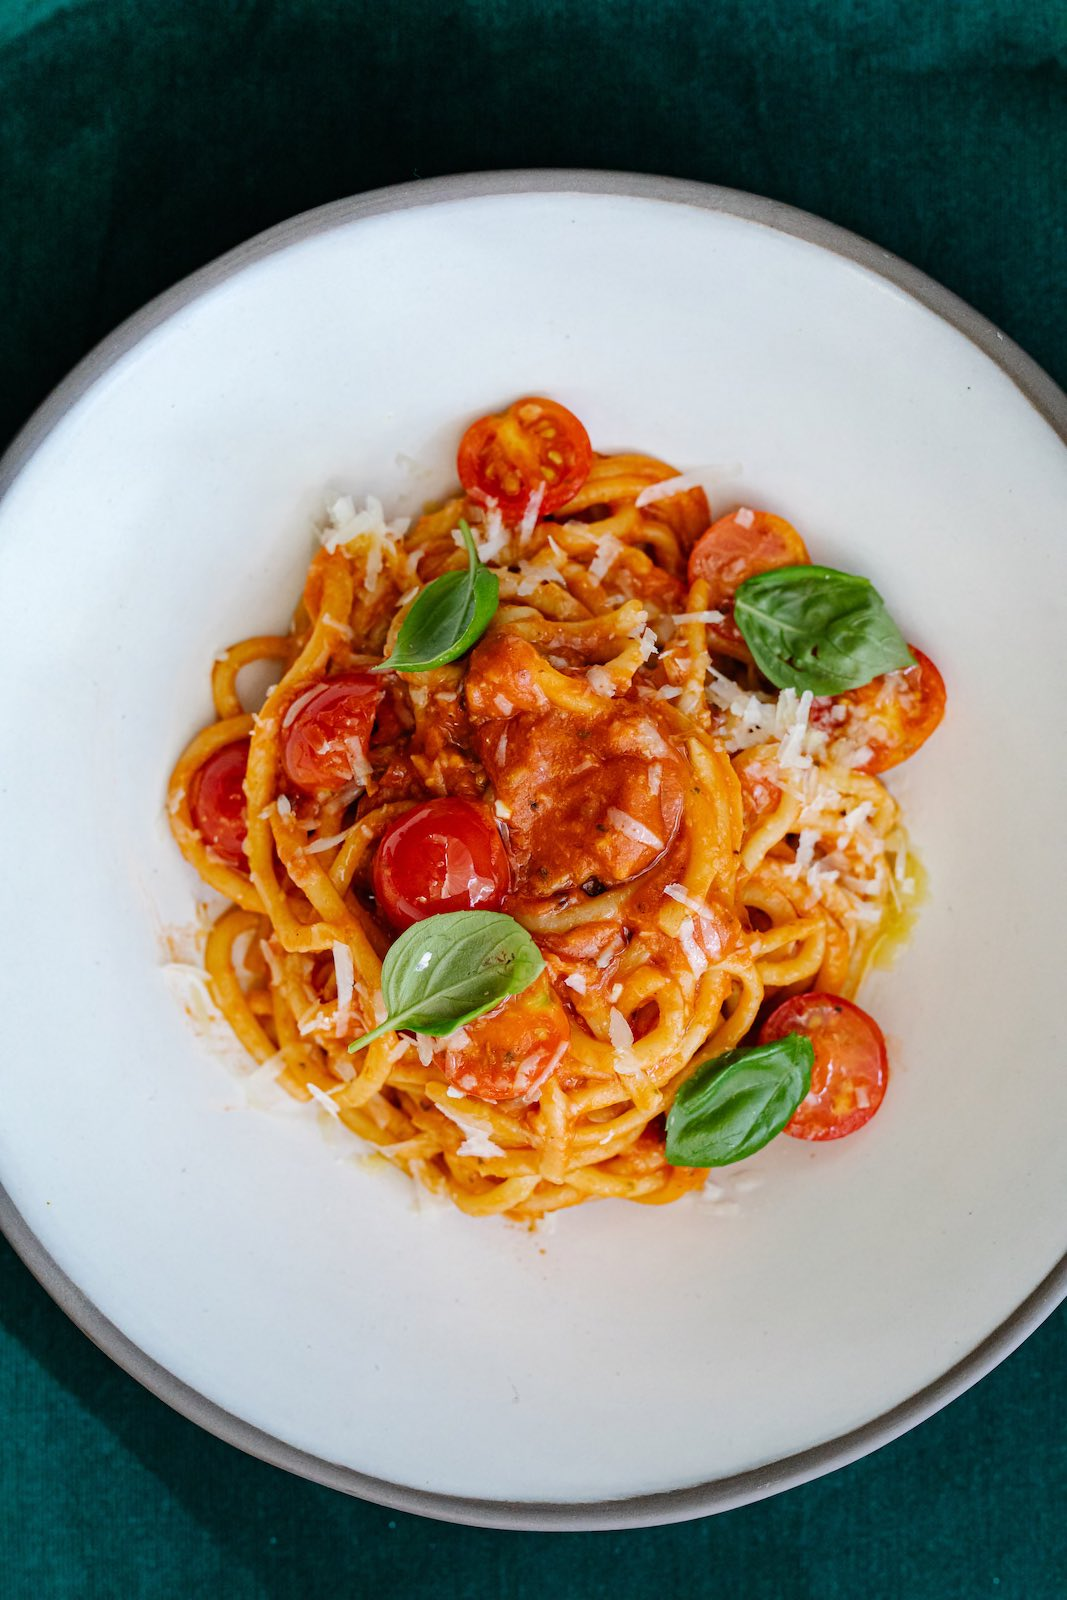 Calabrian chile adds a zip to the bucatini alla Amatriciani at Osteria Georgi